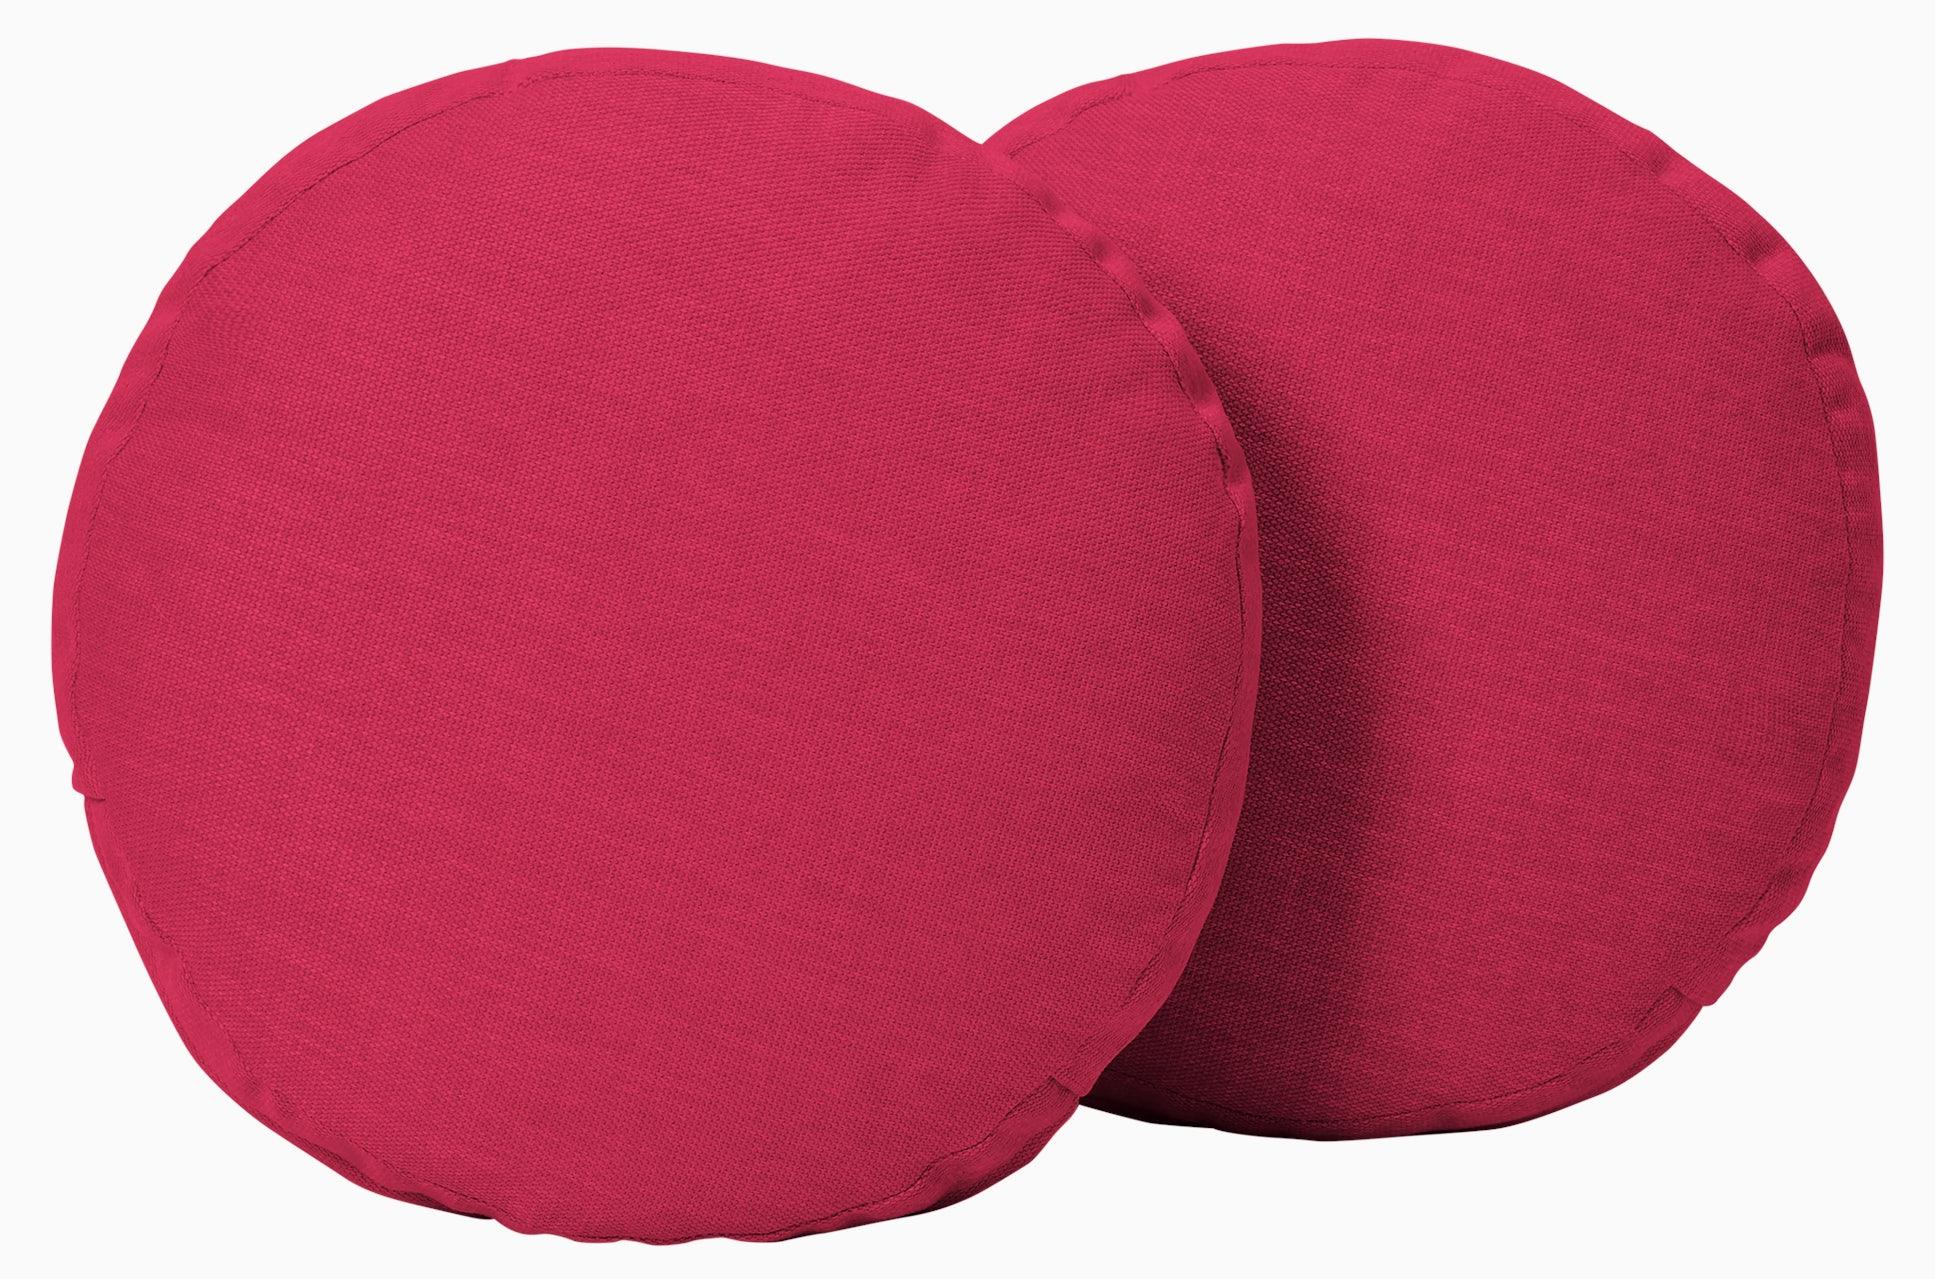 decorative round pillows %28set 2%29 key largo bubblegum